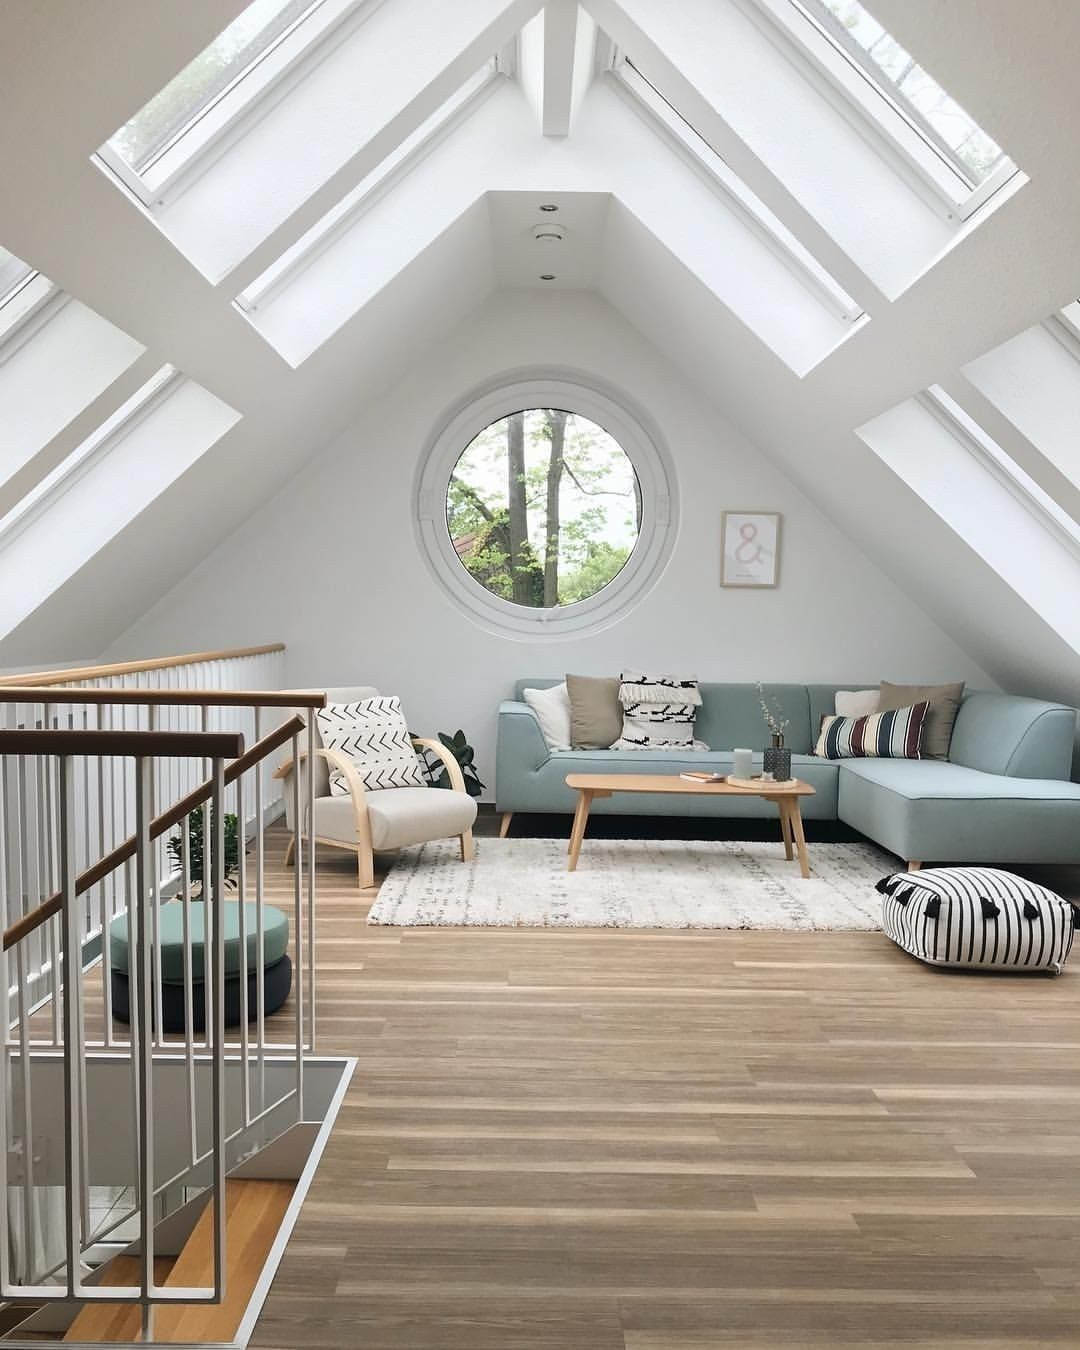 Tetoter Otletek Ez Tetszeni Fog Homeinfo Hu Attic Bedroom Small Attic Bedroom Designs Attic Design Ideas